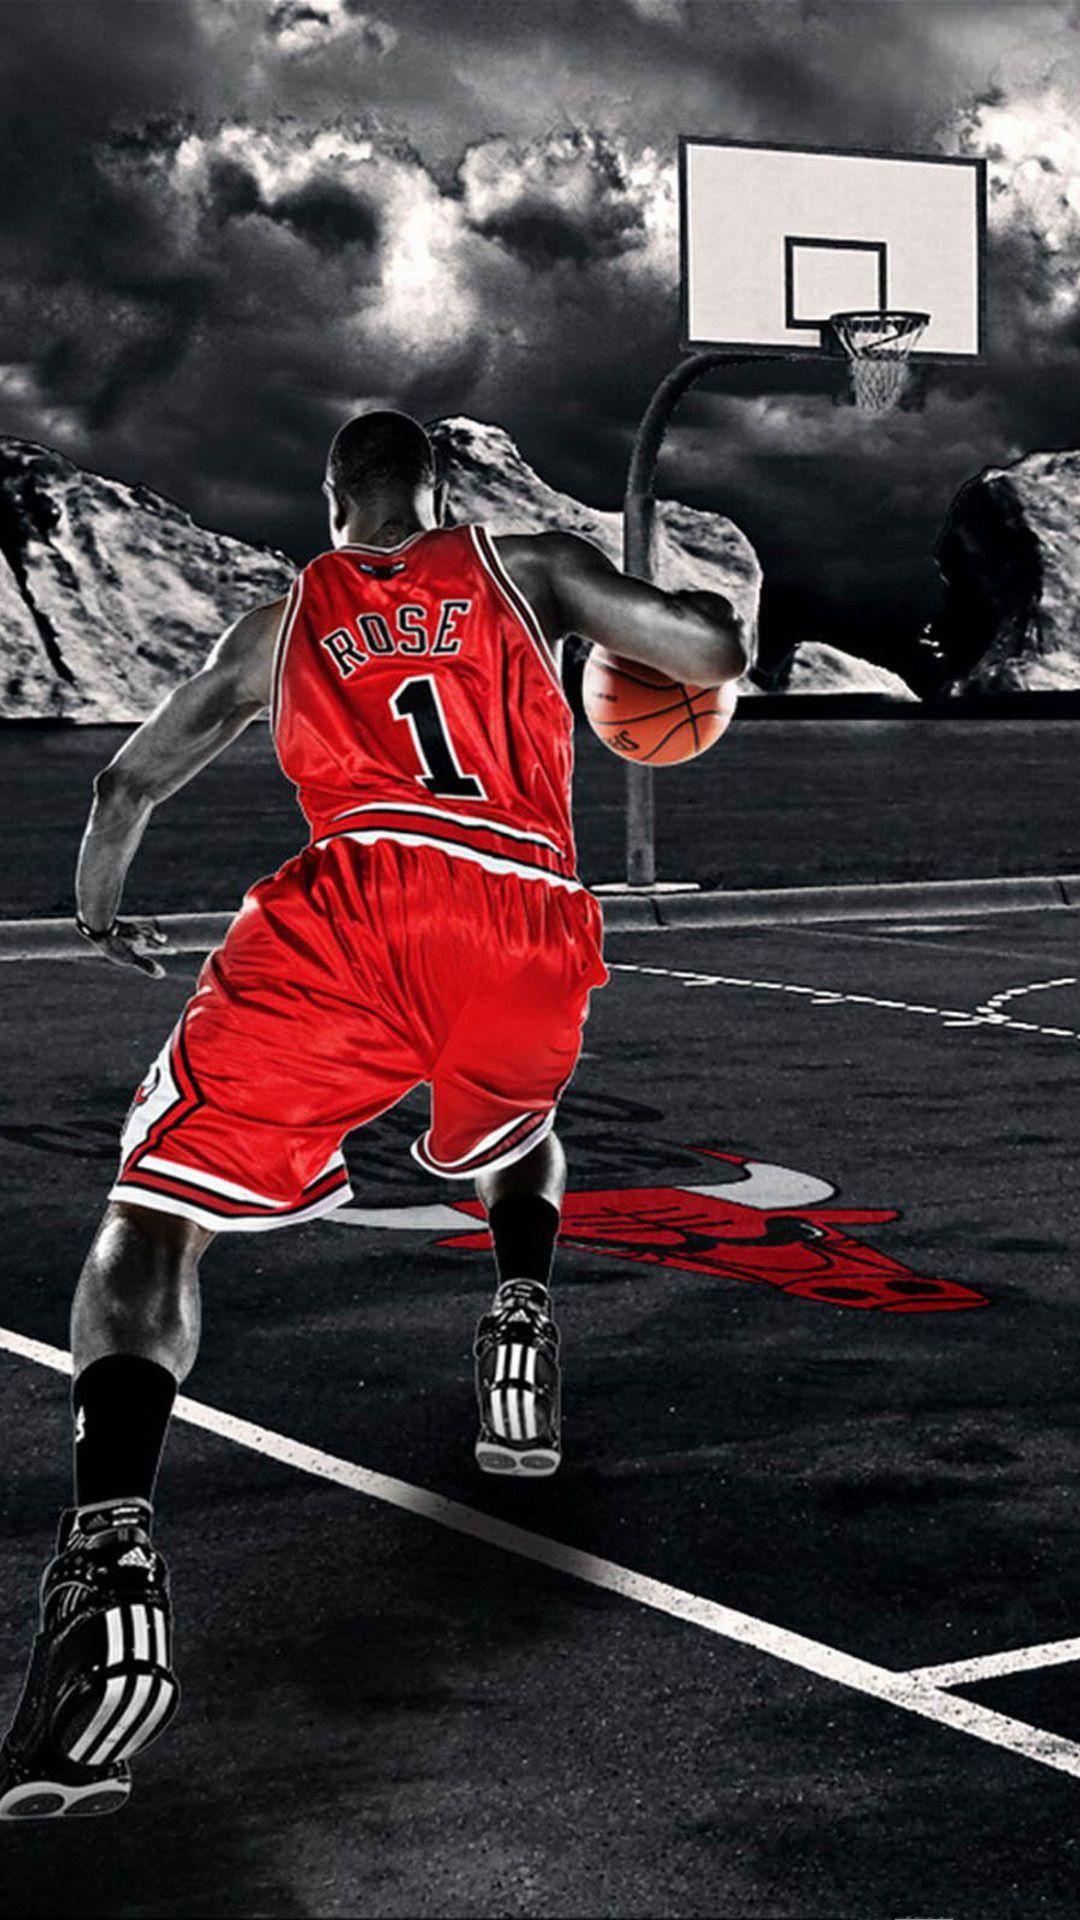 Download Free Basketball Iphone Wallpaper Basketball Iphone Wallpaper Basketball Background Derrick Rose Wallpapers